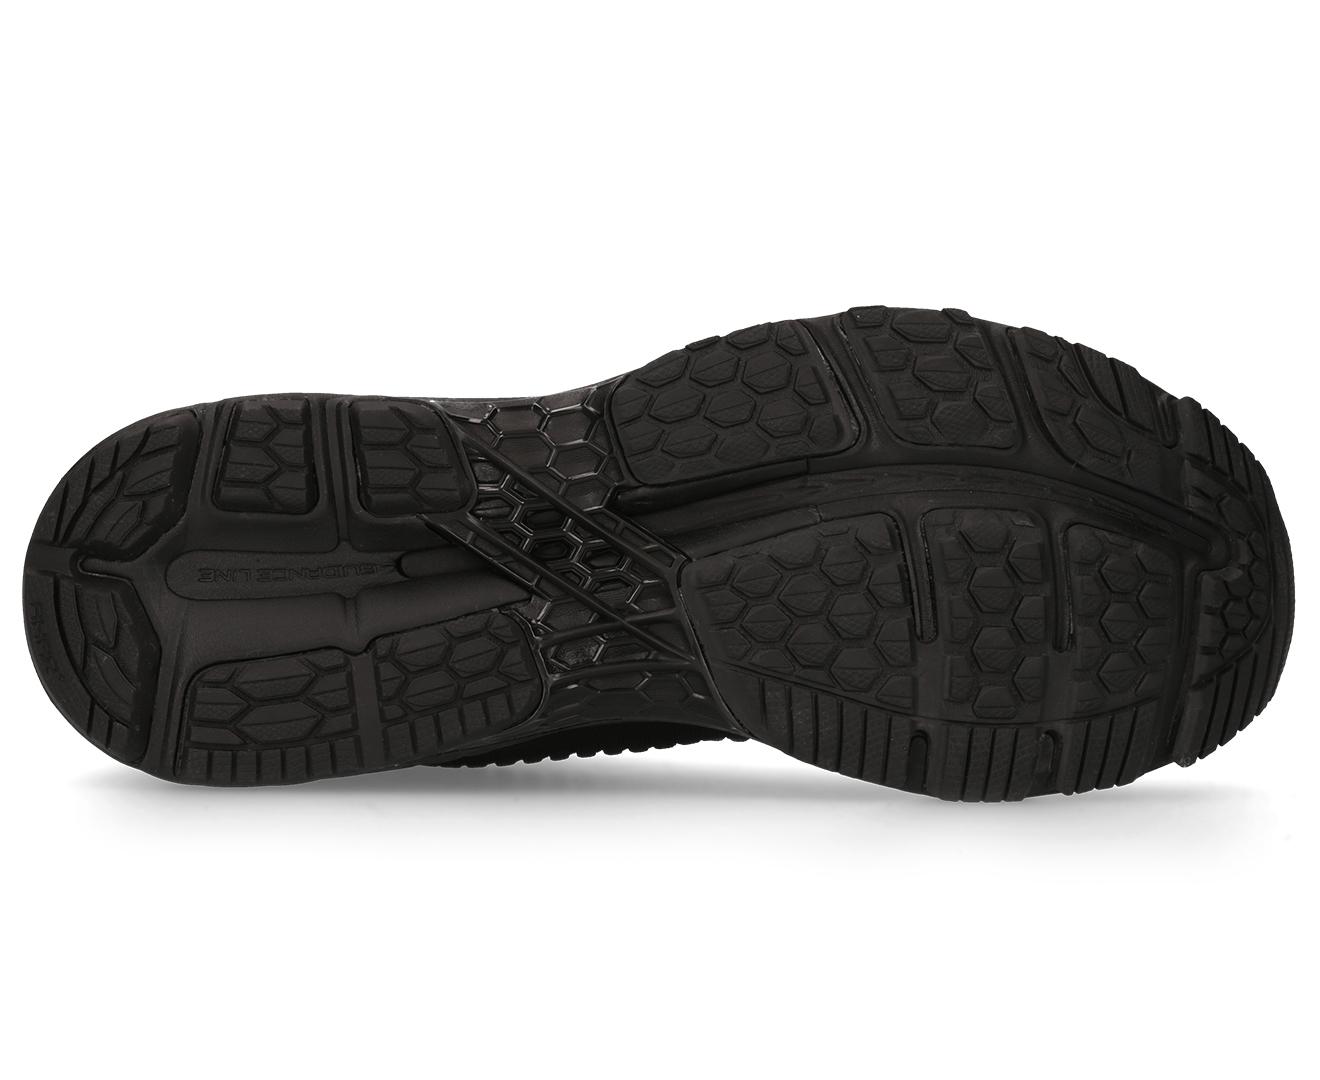 ASICS Kayano 25 Shoe for Mens - Black